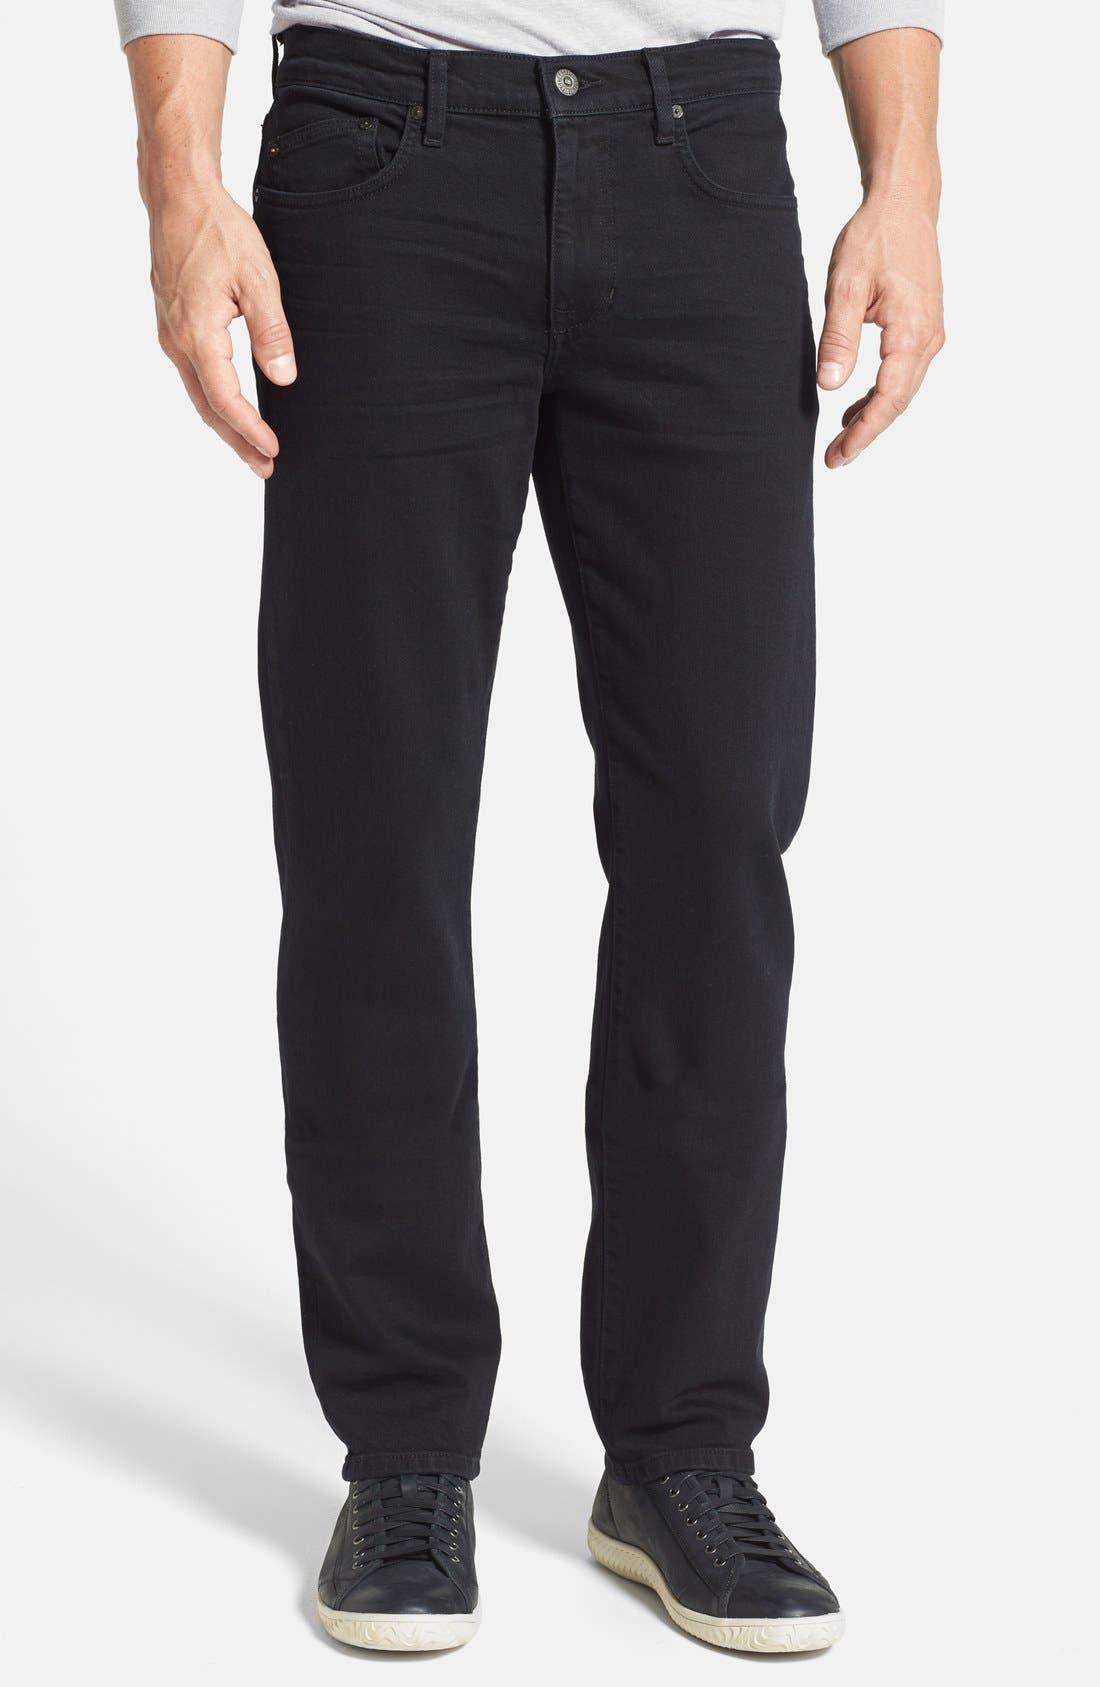 Alternate Image 1 Selected - Joe's 'Brixton' Slim Fit Jeans (Zayden)